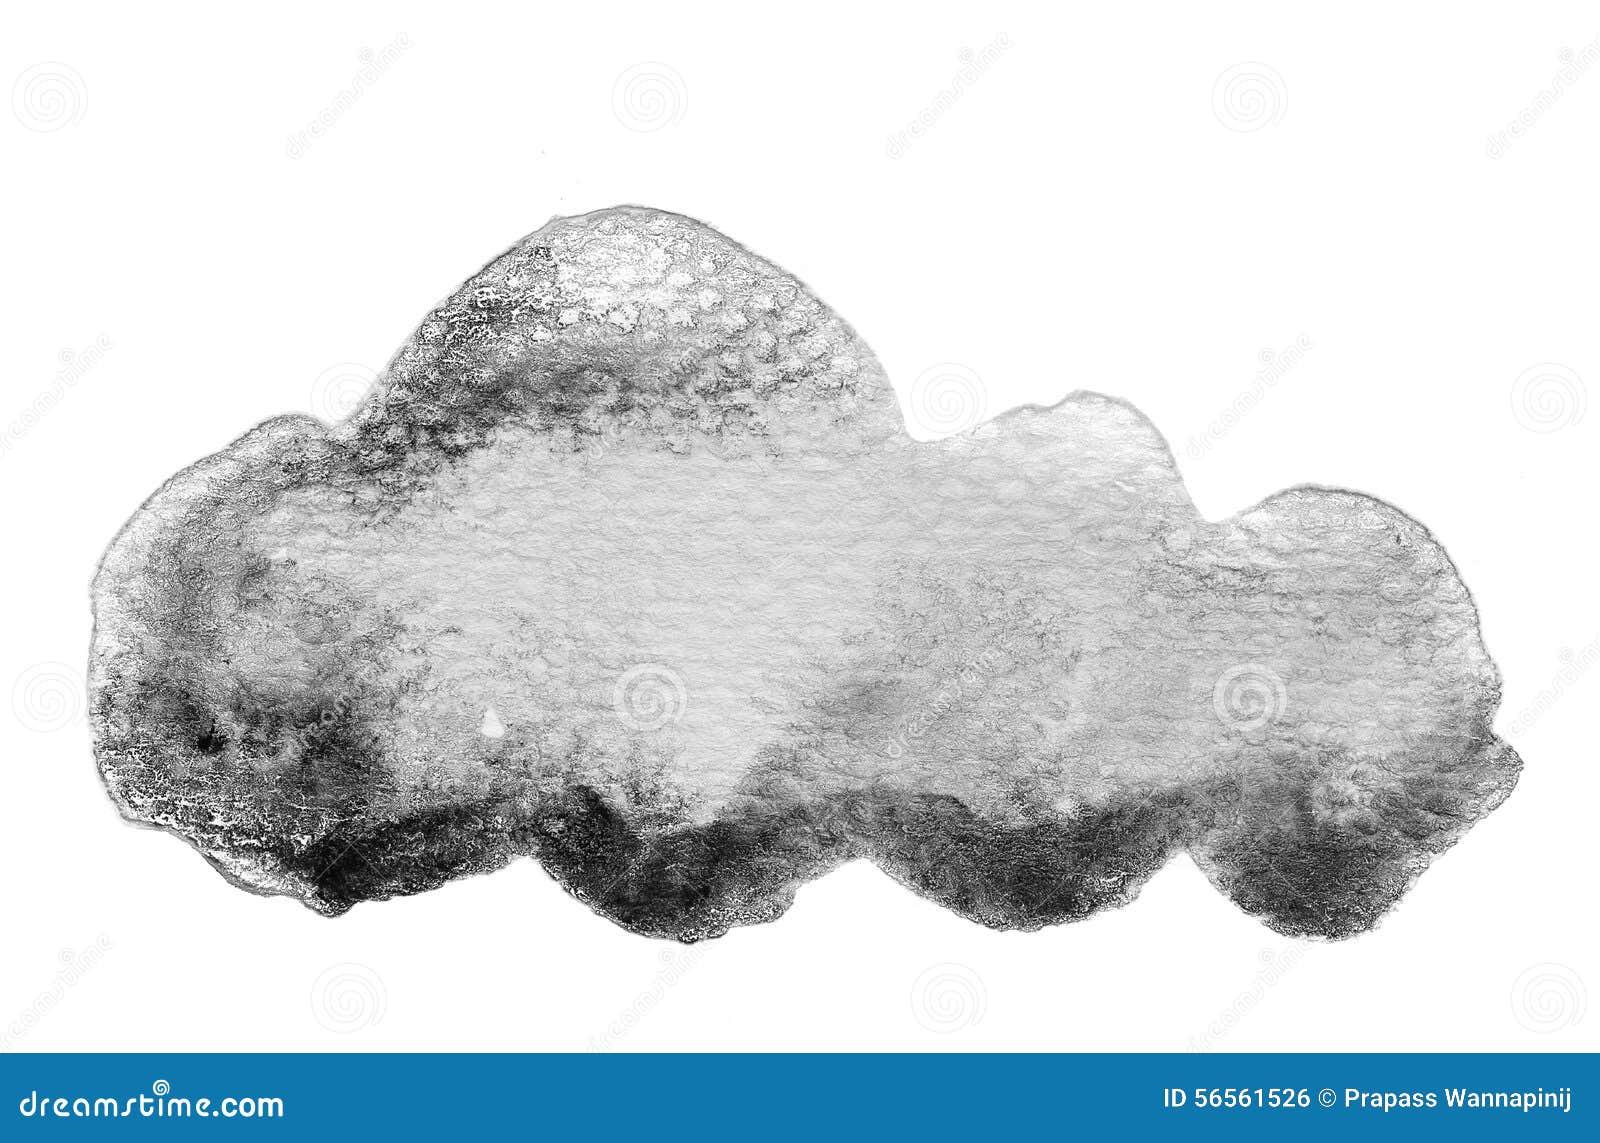 Download Γραπτό υπόβαθρο υδατοχρώματος Απεικόνιση αποθεμάτων - εικονογραφία από μαύρα, σύννεφο: 56561526